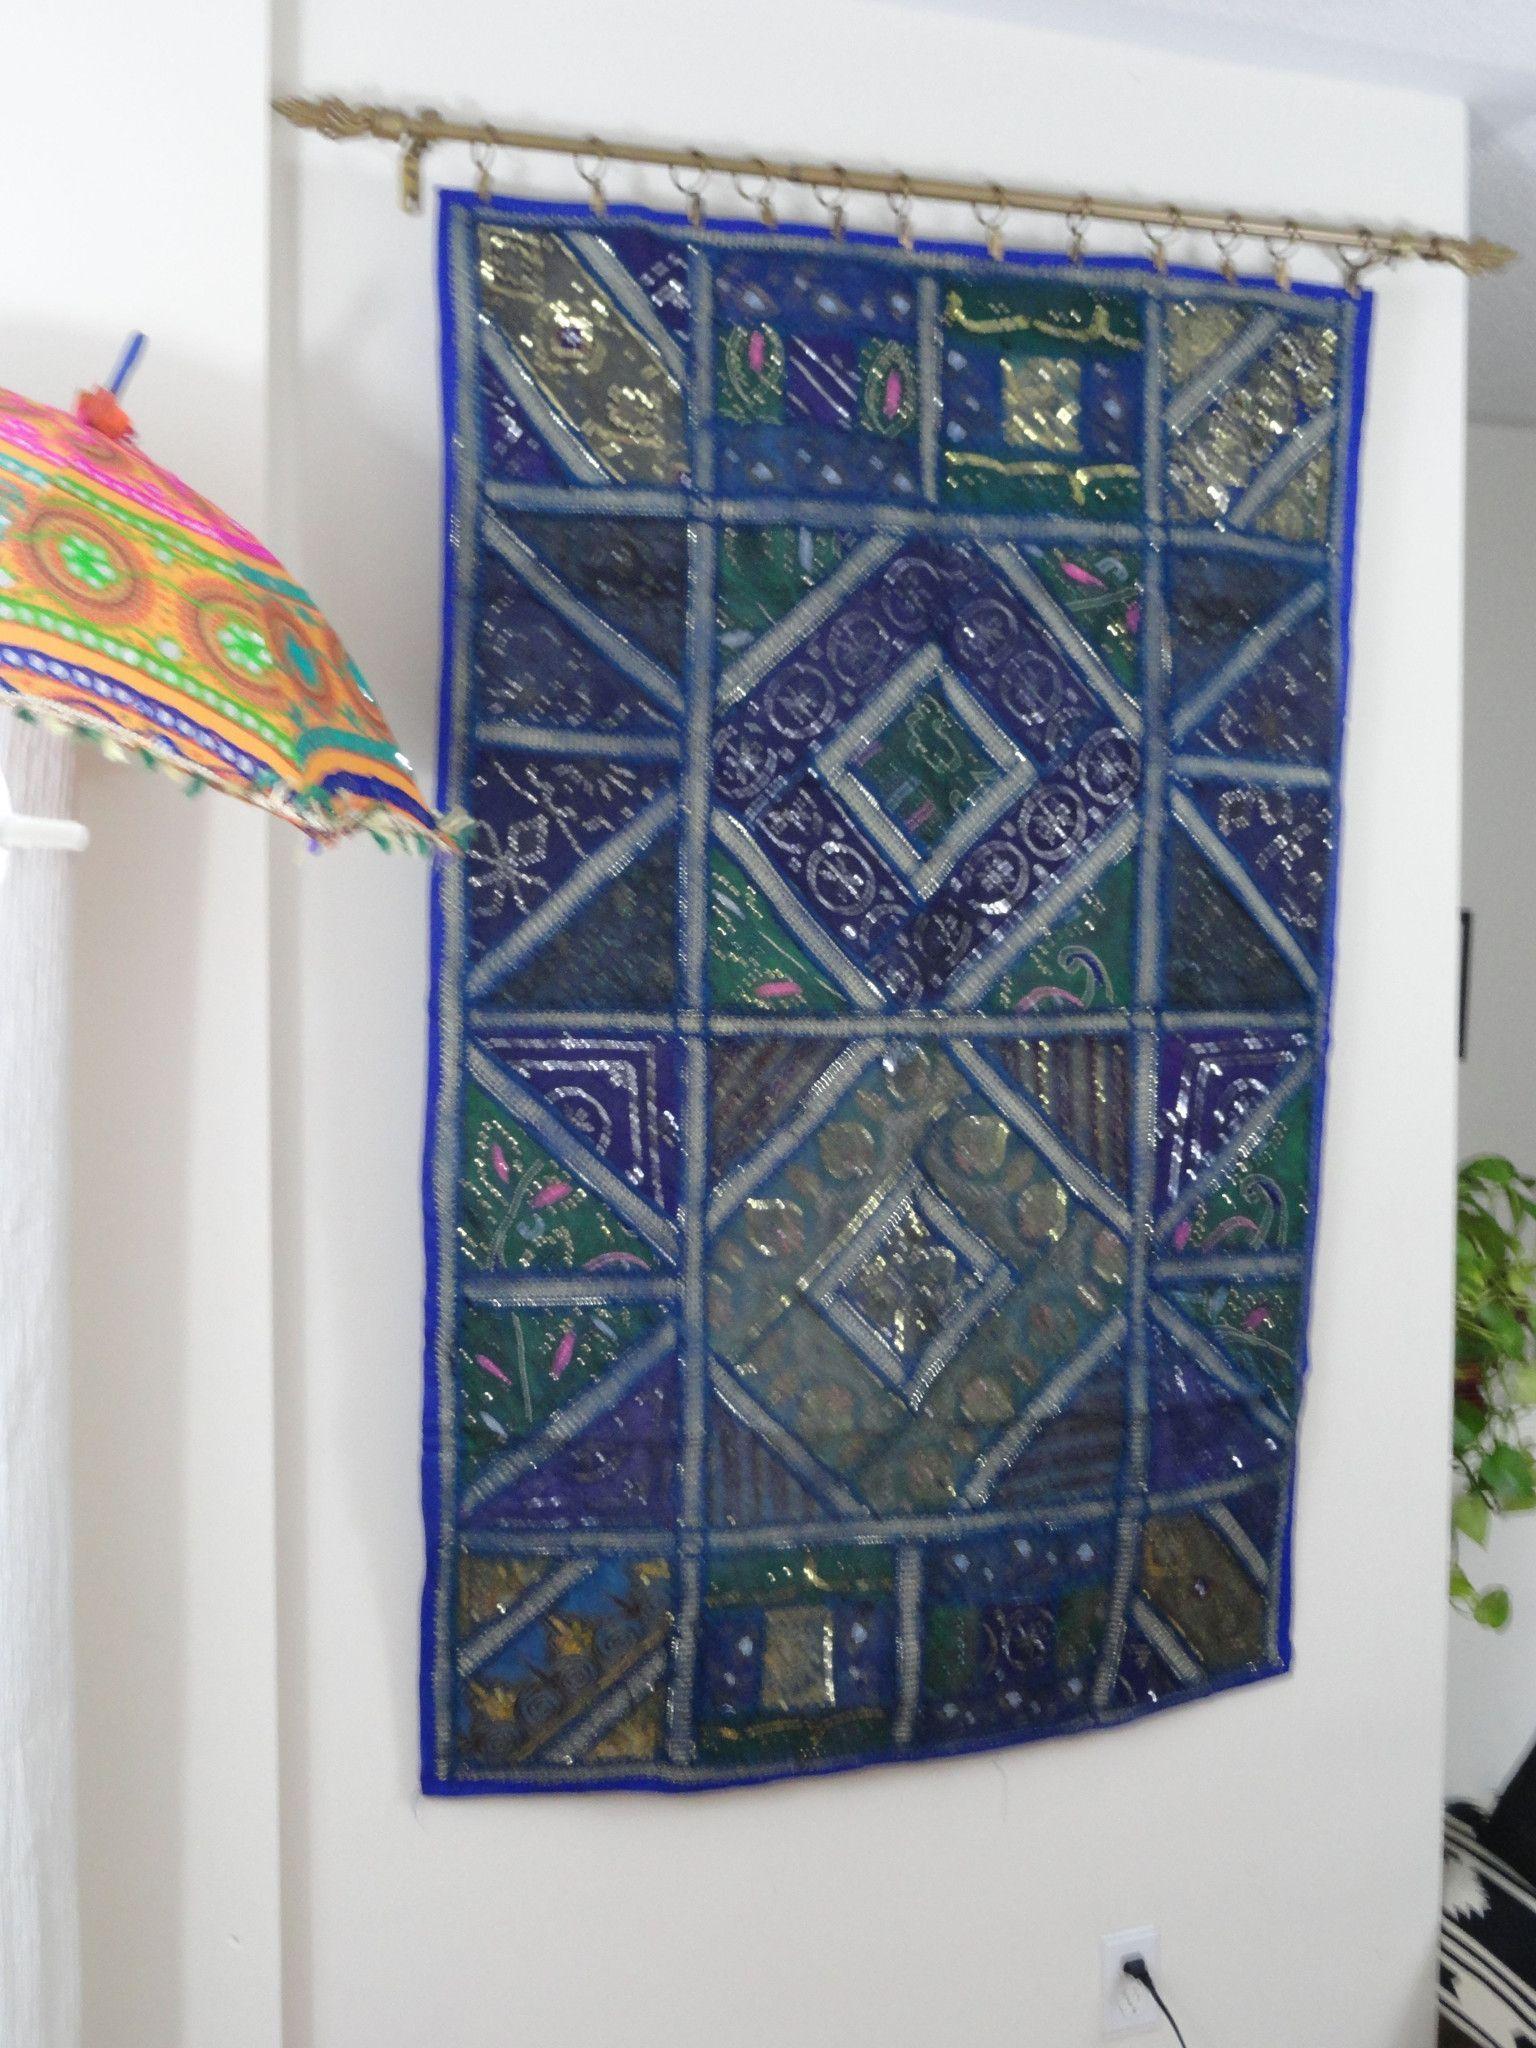 "Ethnic Wall Tapestry. Home decor idea ""Blue Ganges""- Fabric Wall Hanging wall decor. Indian ethnic wall tapestry. Artikrti"